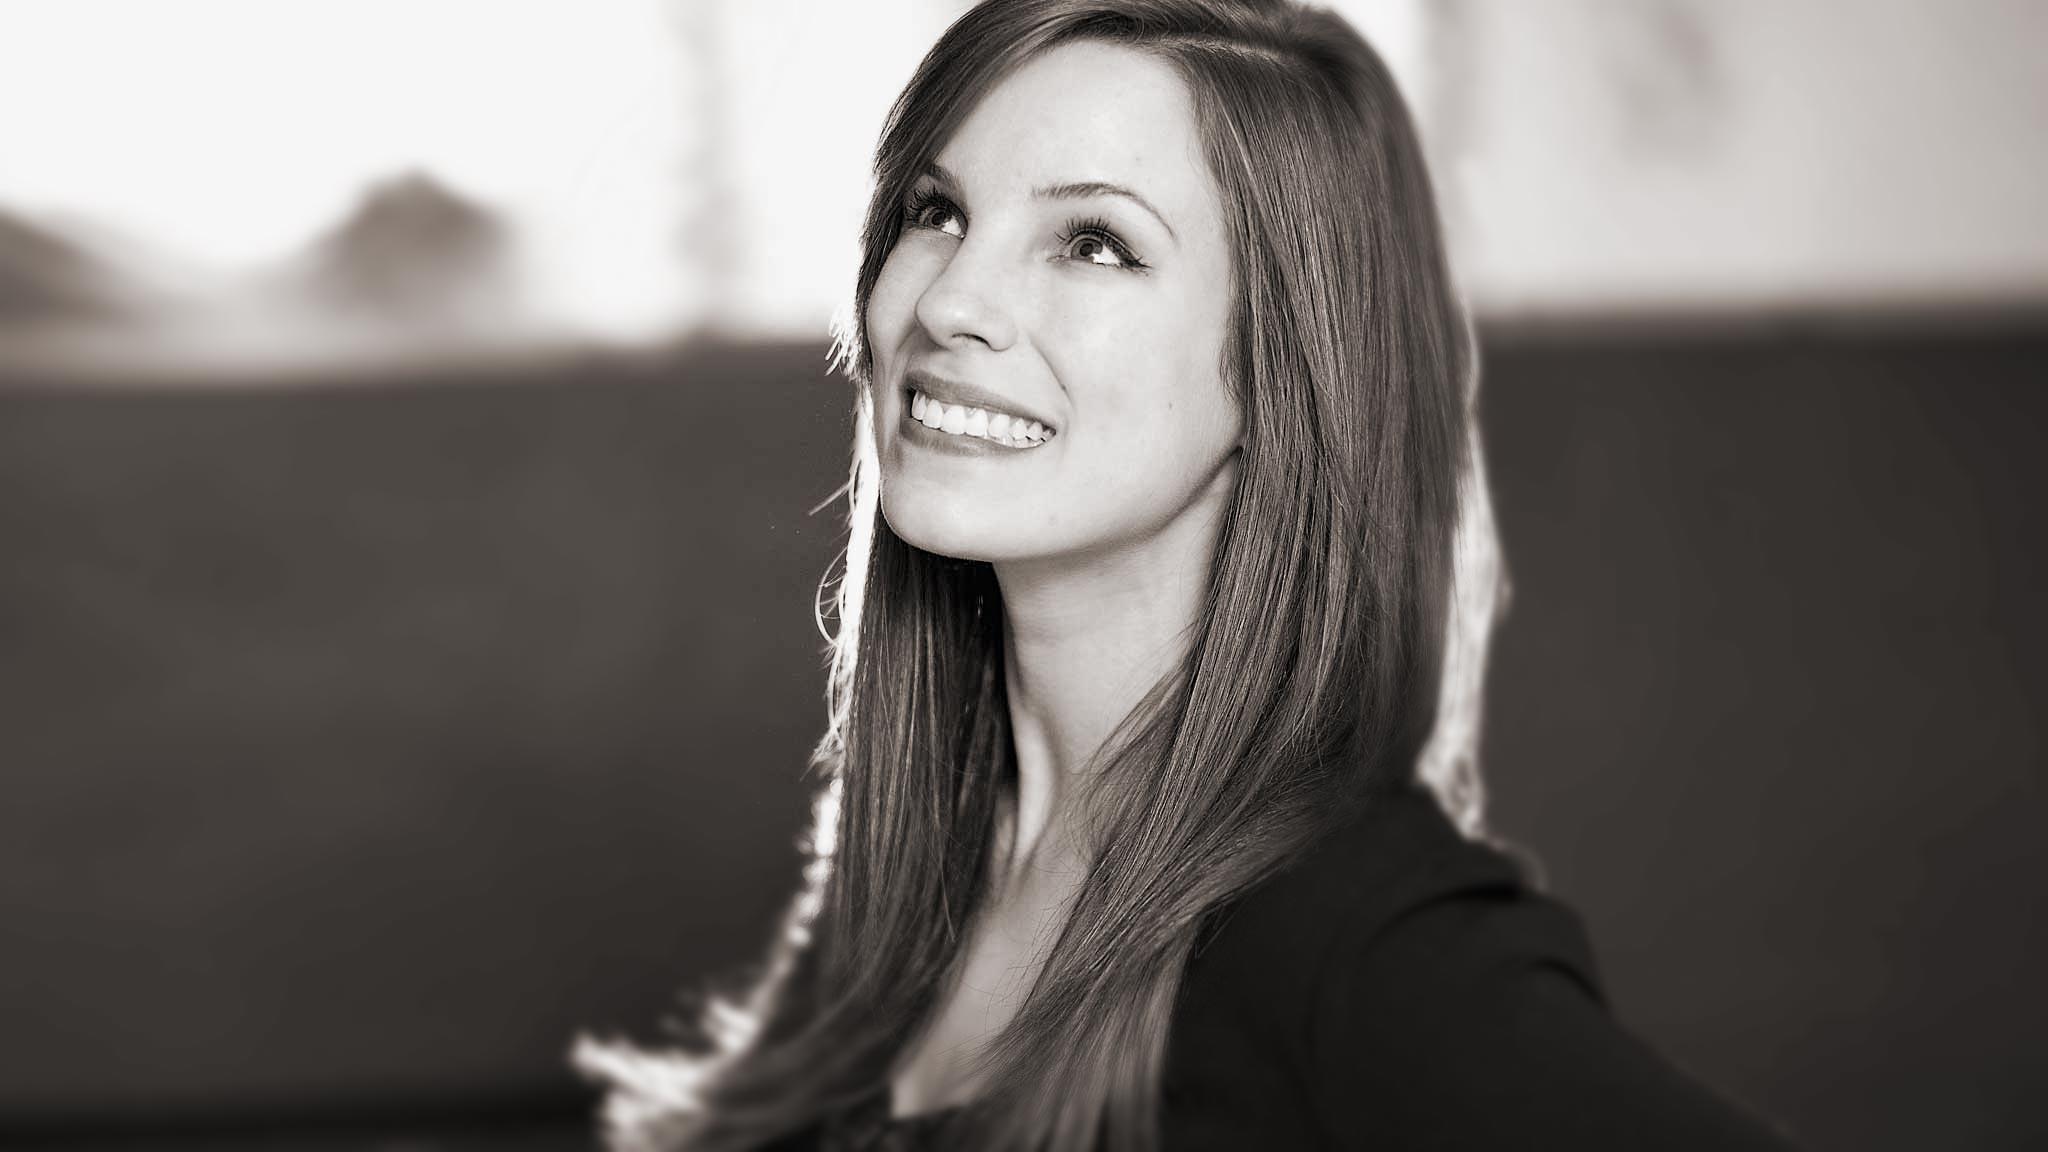 photographe portrait nancy metz strasbourg femme book lifestyle smile nb